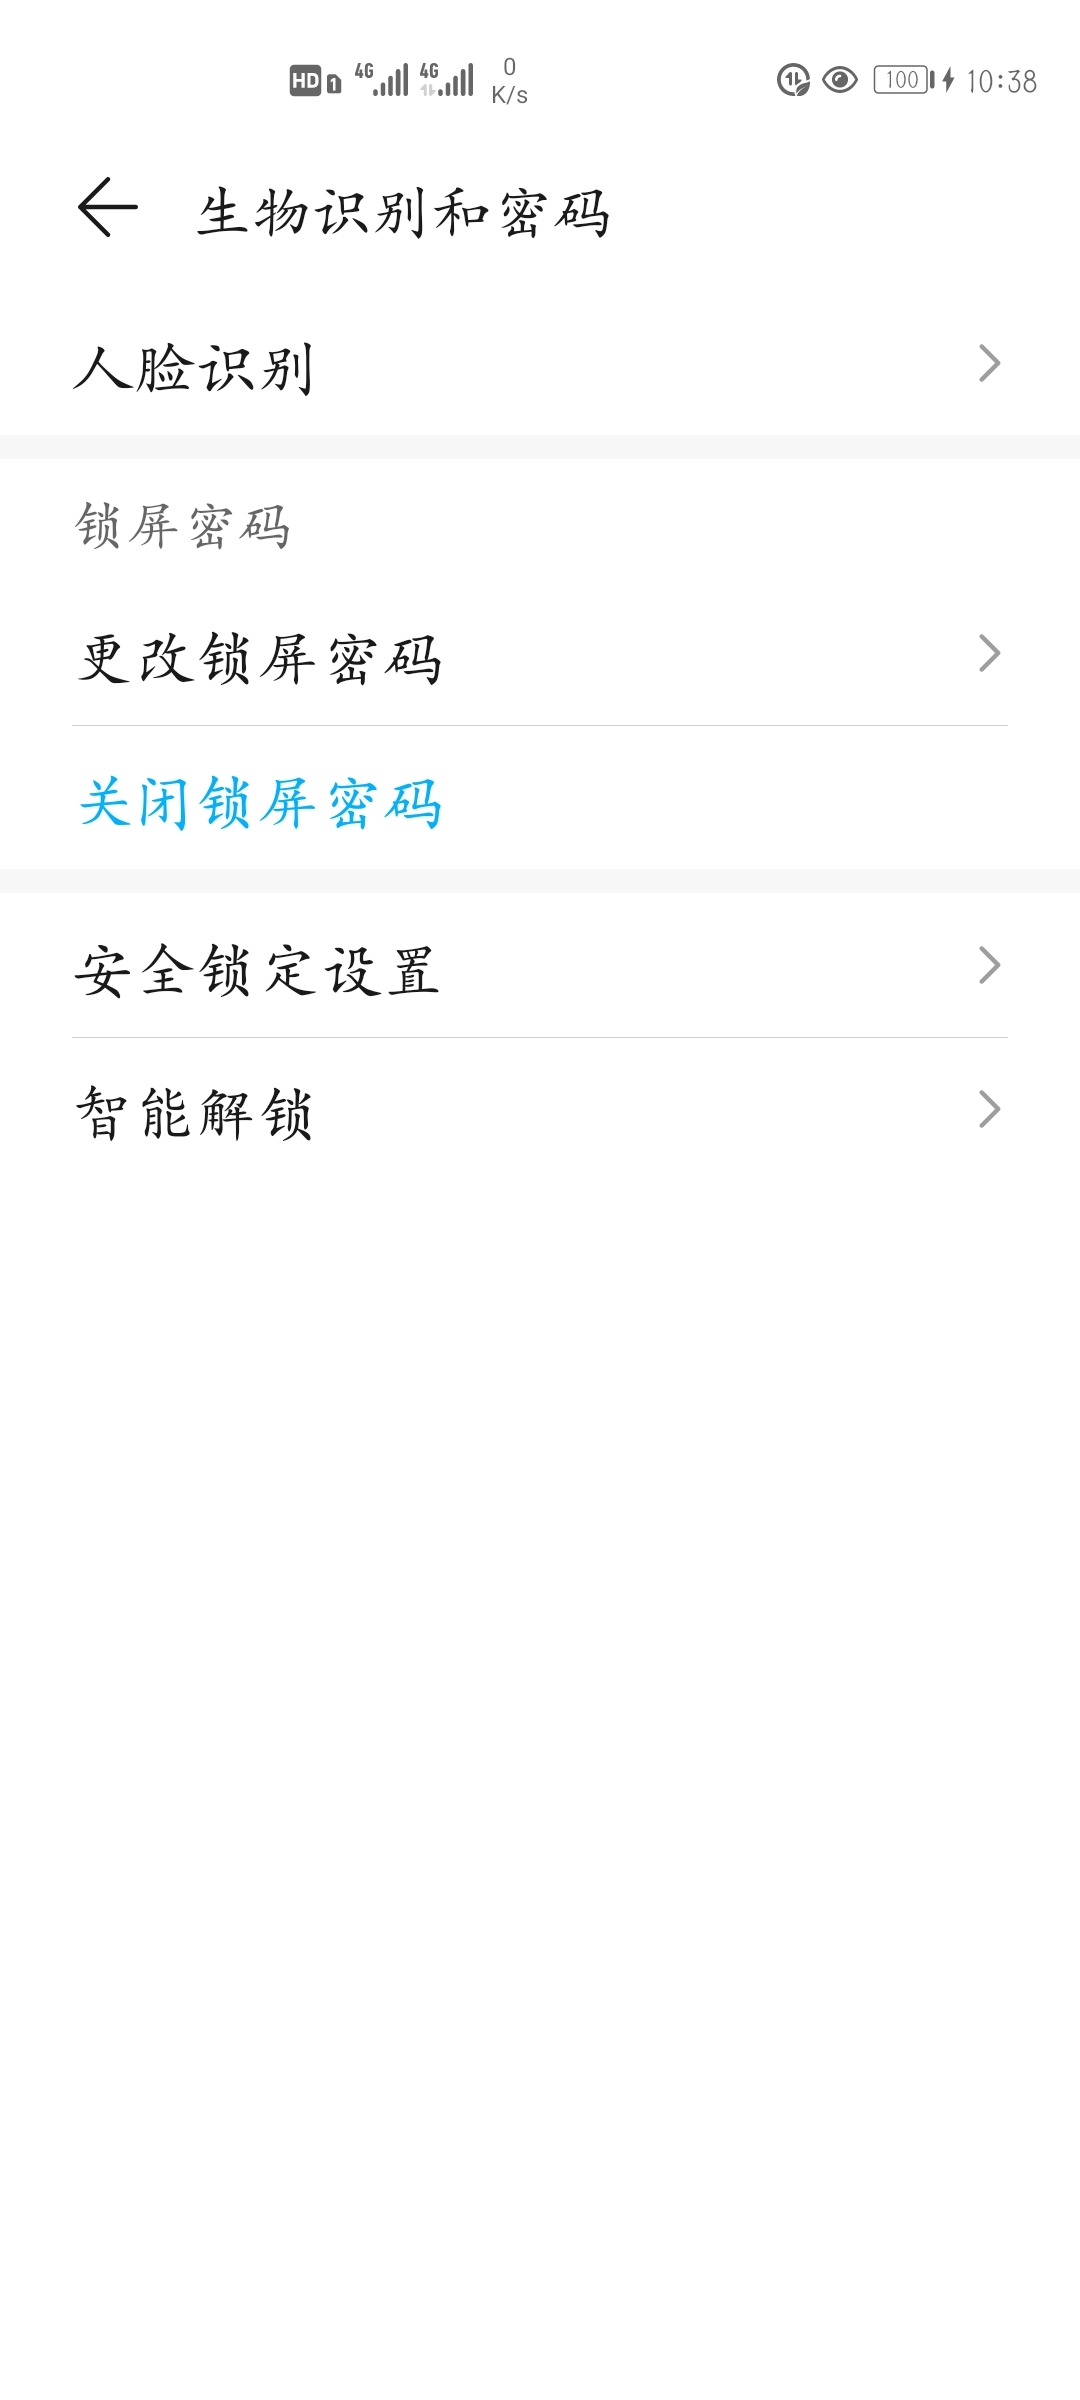 Screenshot_20210516_103812_com.android.settings.jpg